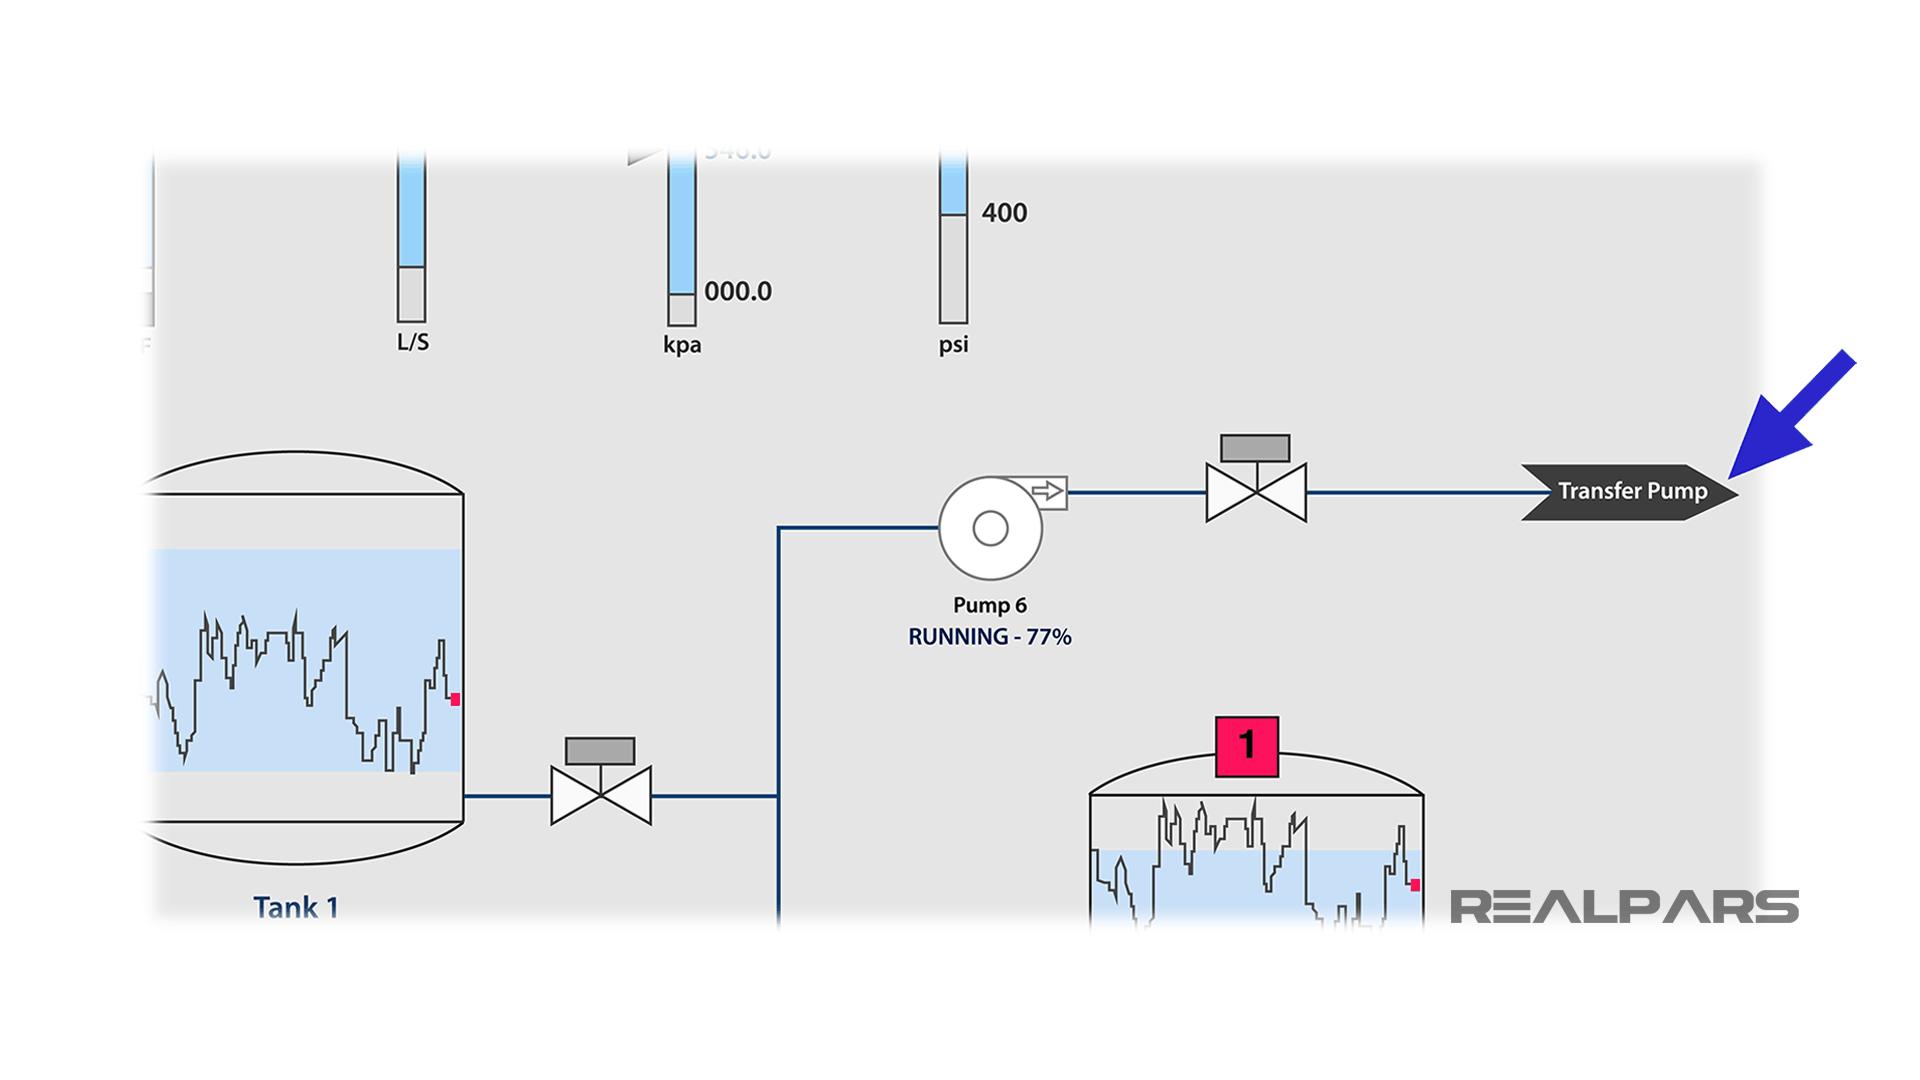 HMI navigation buttons